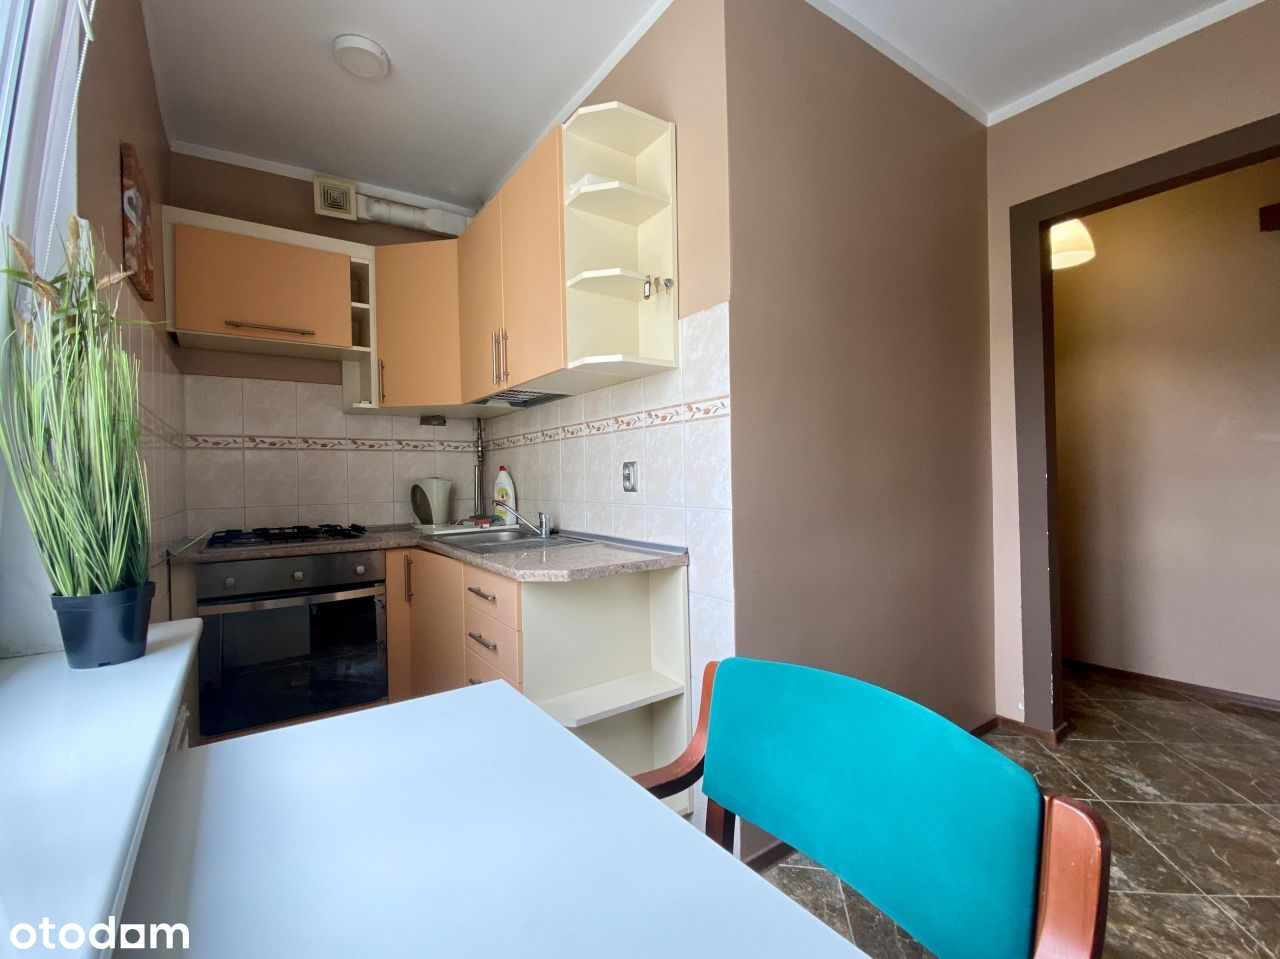 Mieszkanie, 32 m², Olsztyn